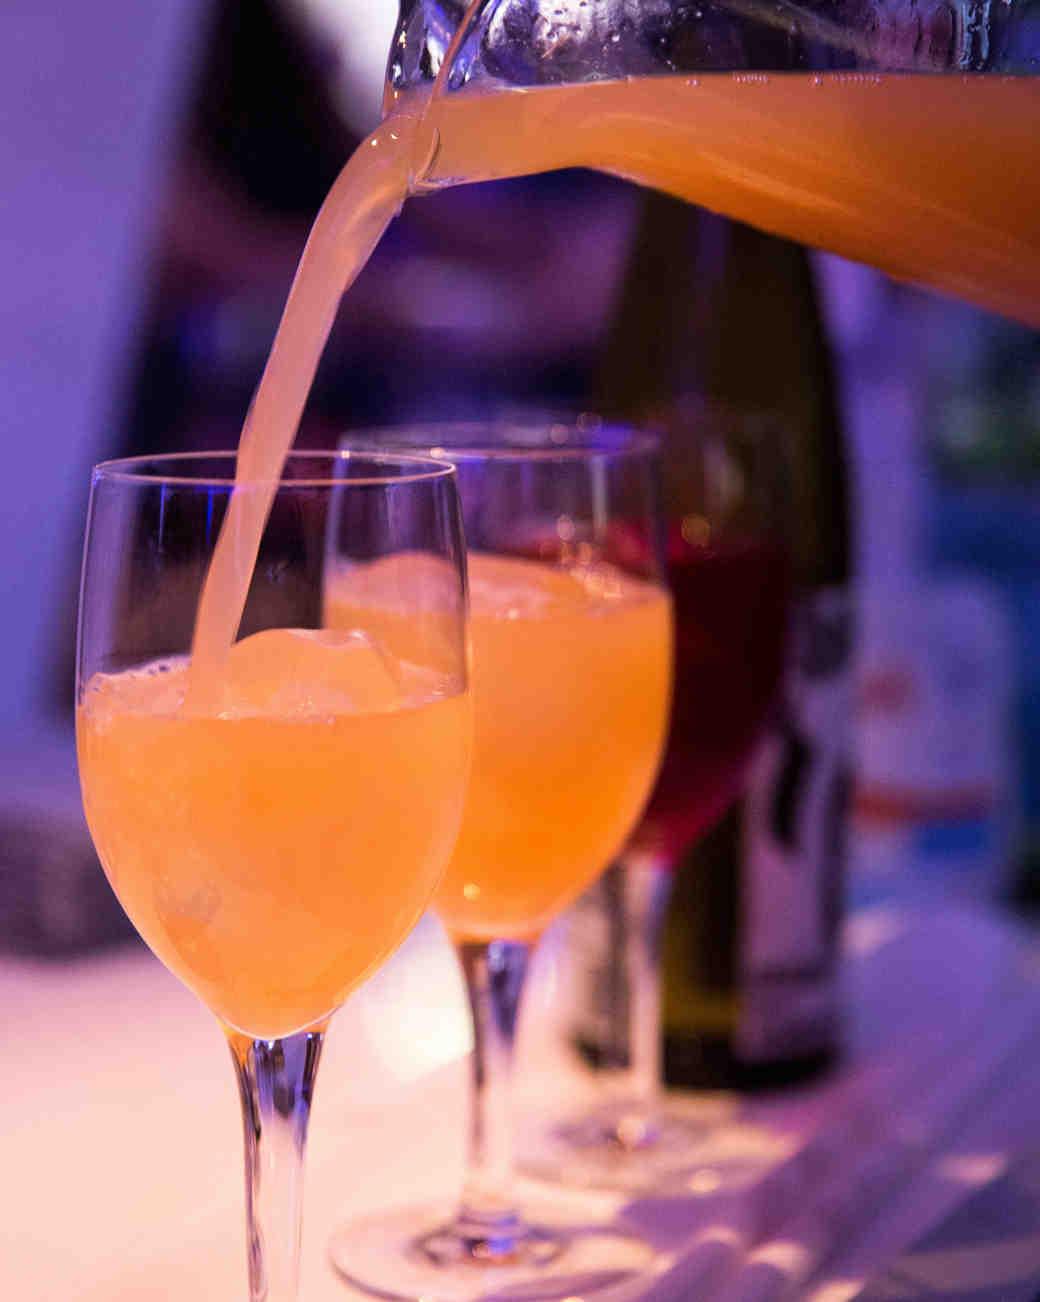 martha-weddings-party-2015-titosvodka-cocktail-1015.jpg